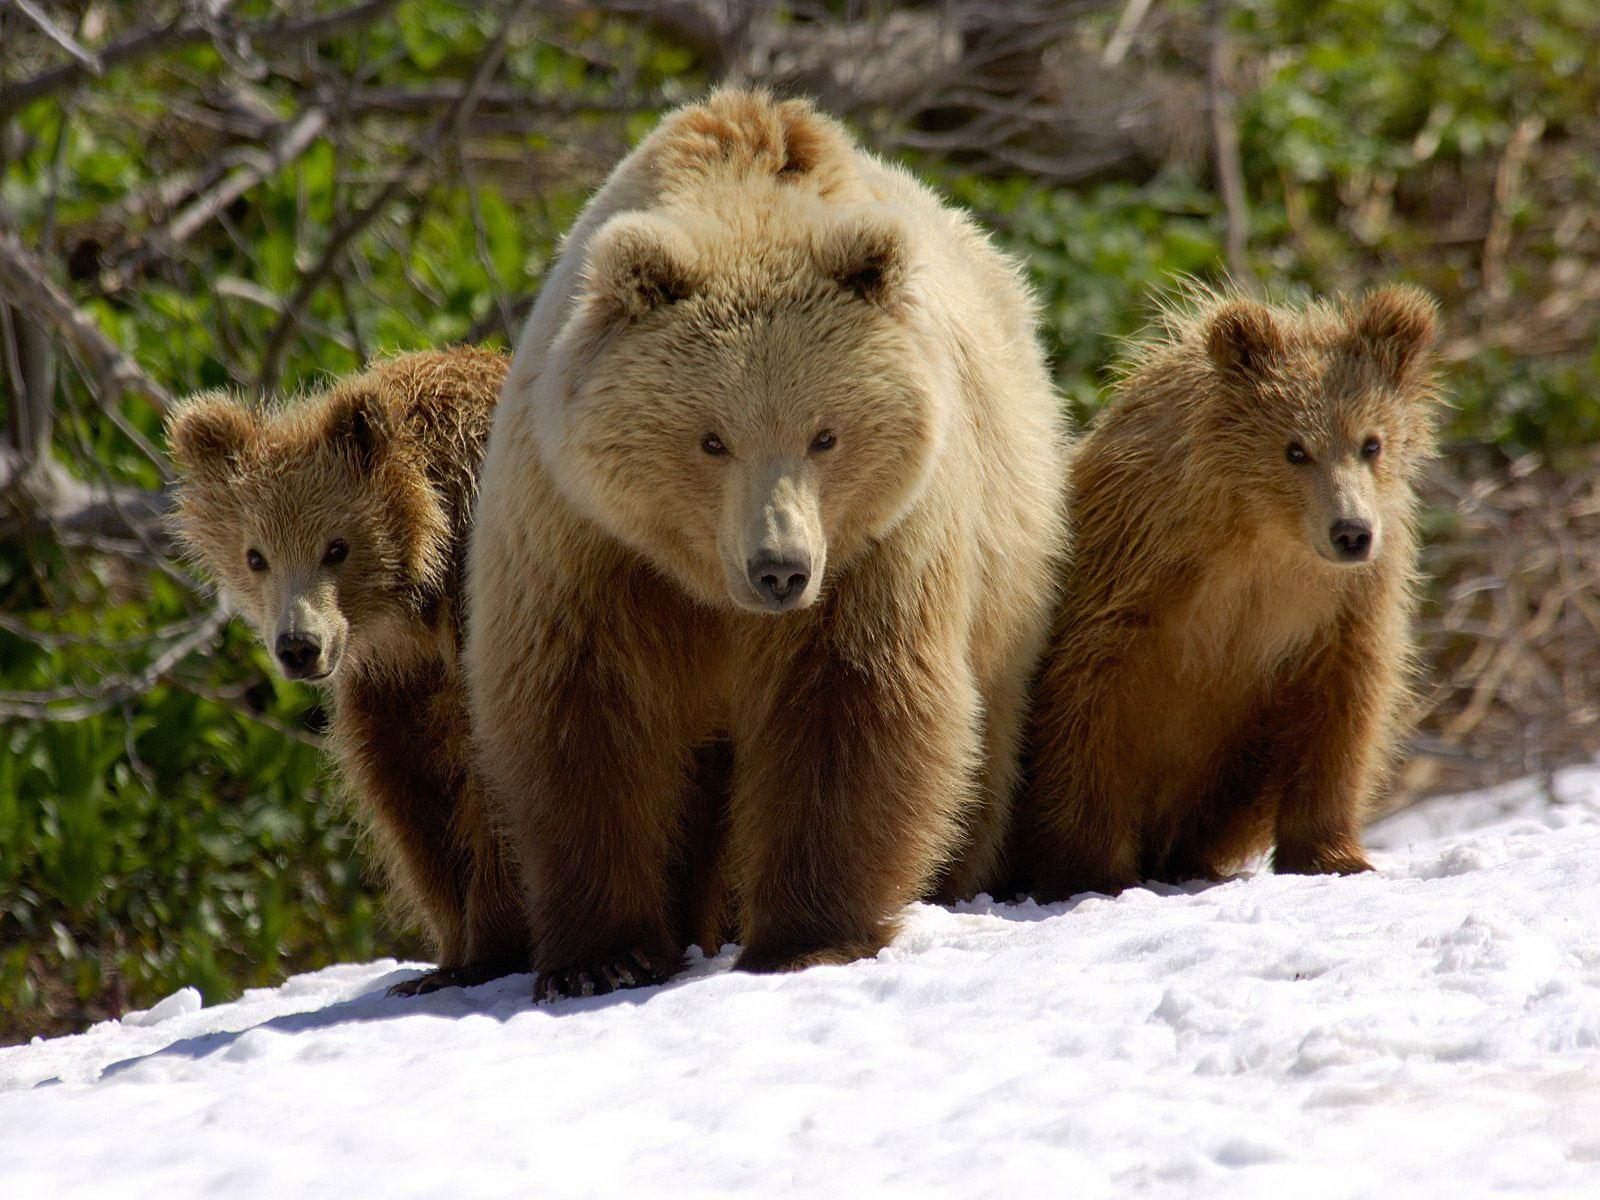 Brown Bear | The Wildlife